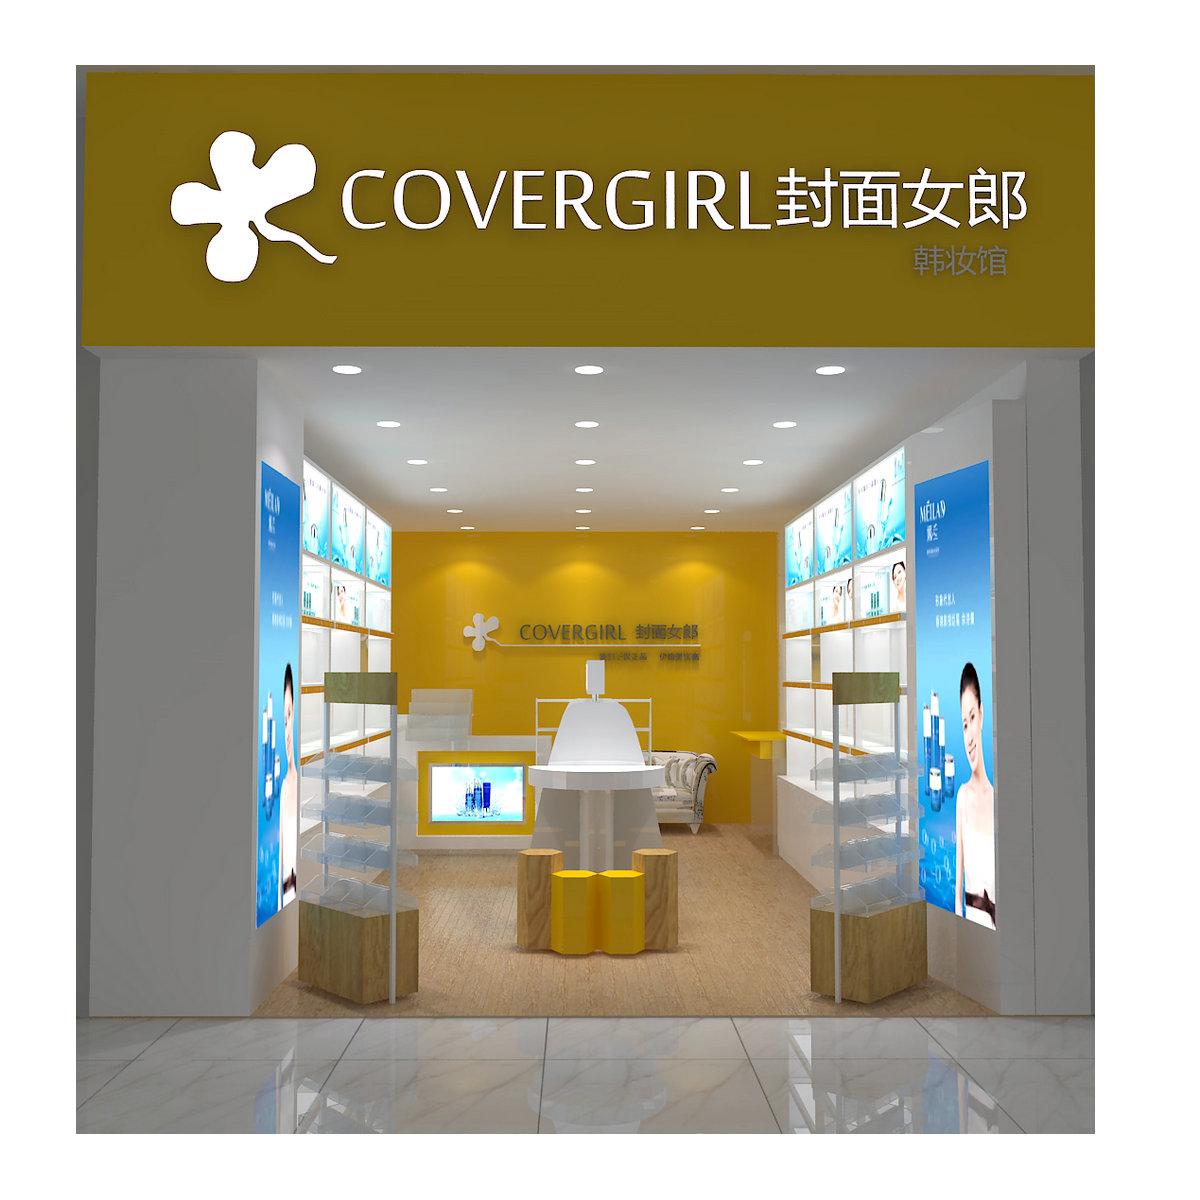 Cosmetic Store Interior Design & Makeup Display Counter in Store